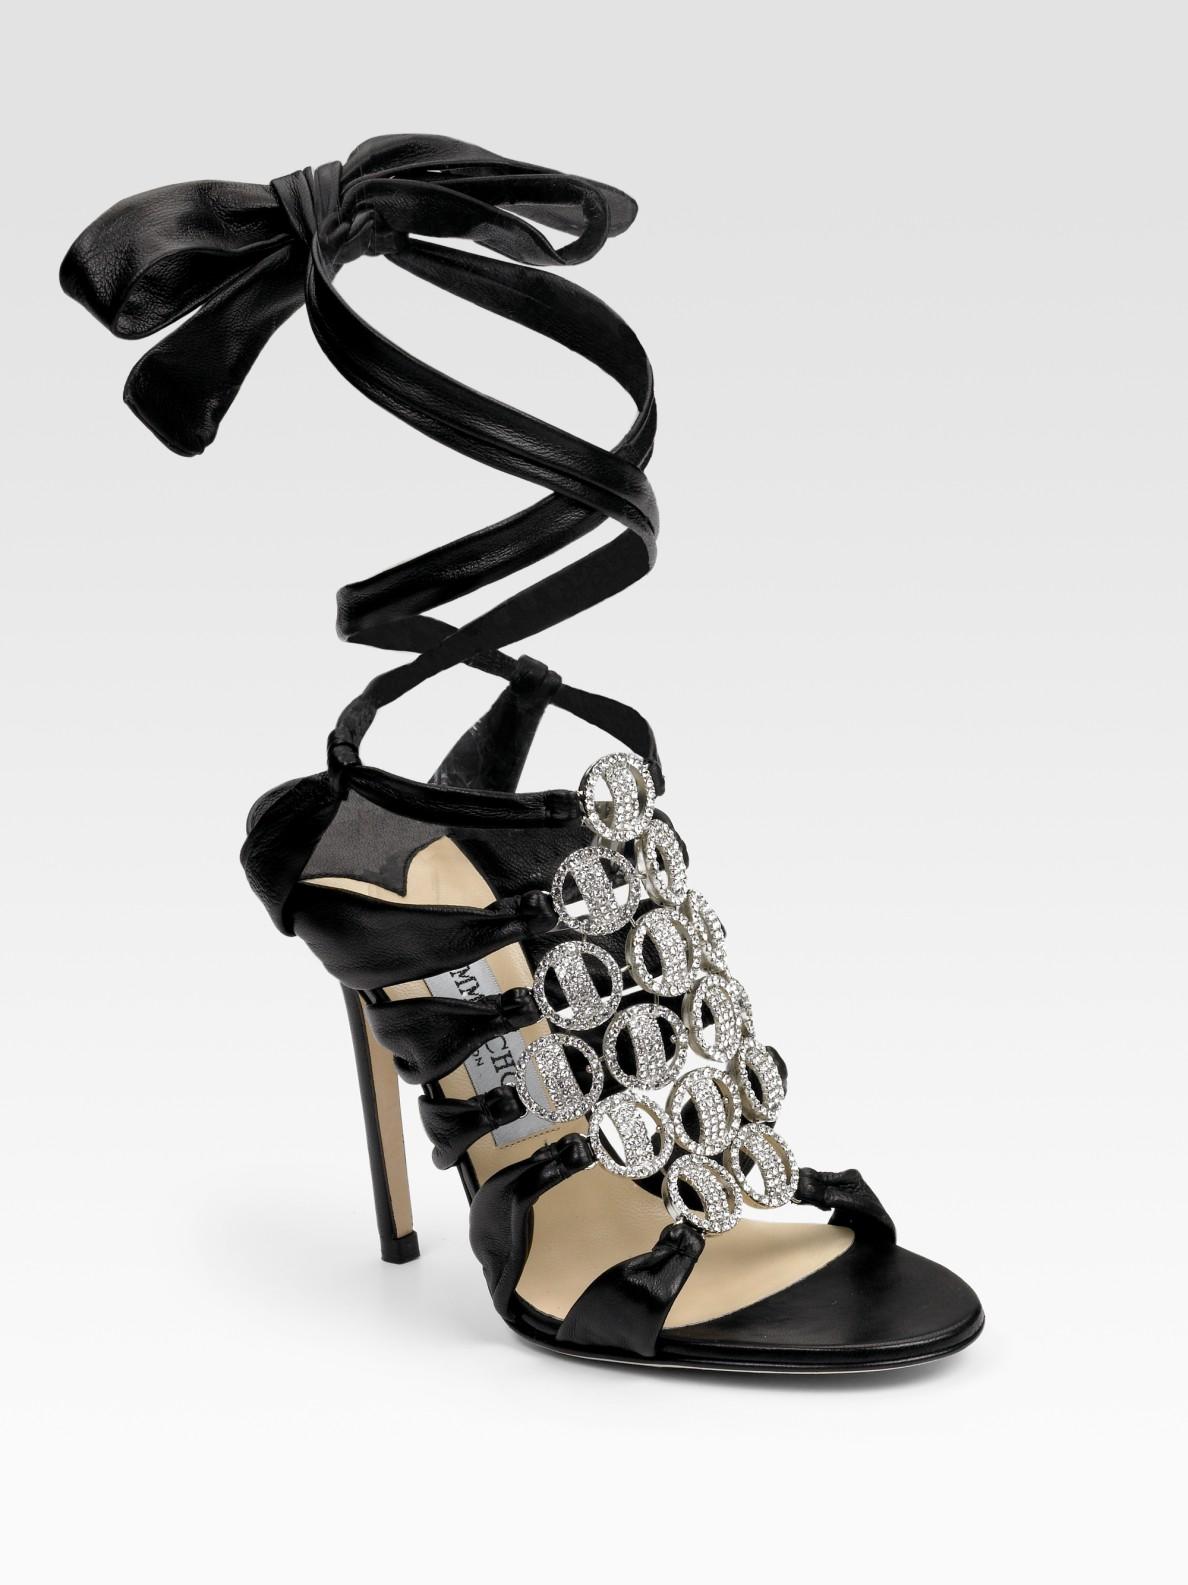 Black sandals debenhams -  Jimmy Choo Strappy Gold Sandals Heels Debenhams Jobs